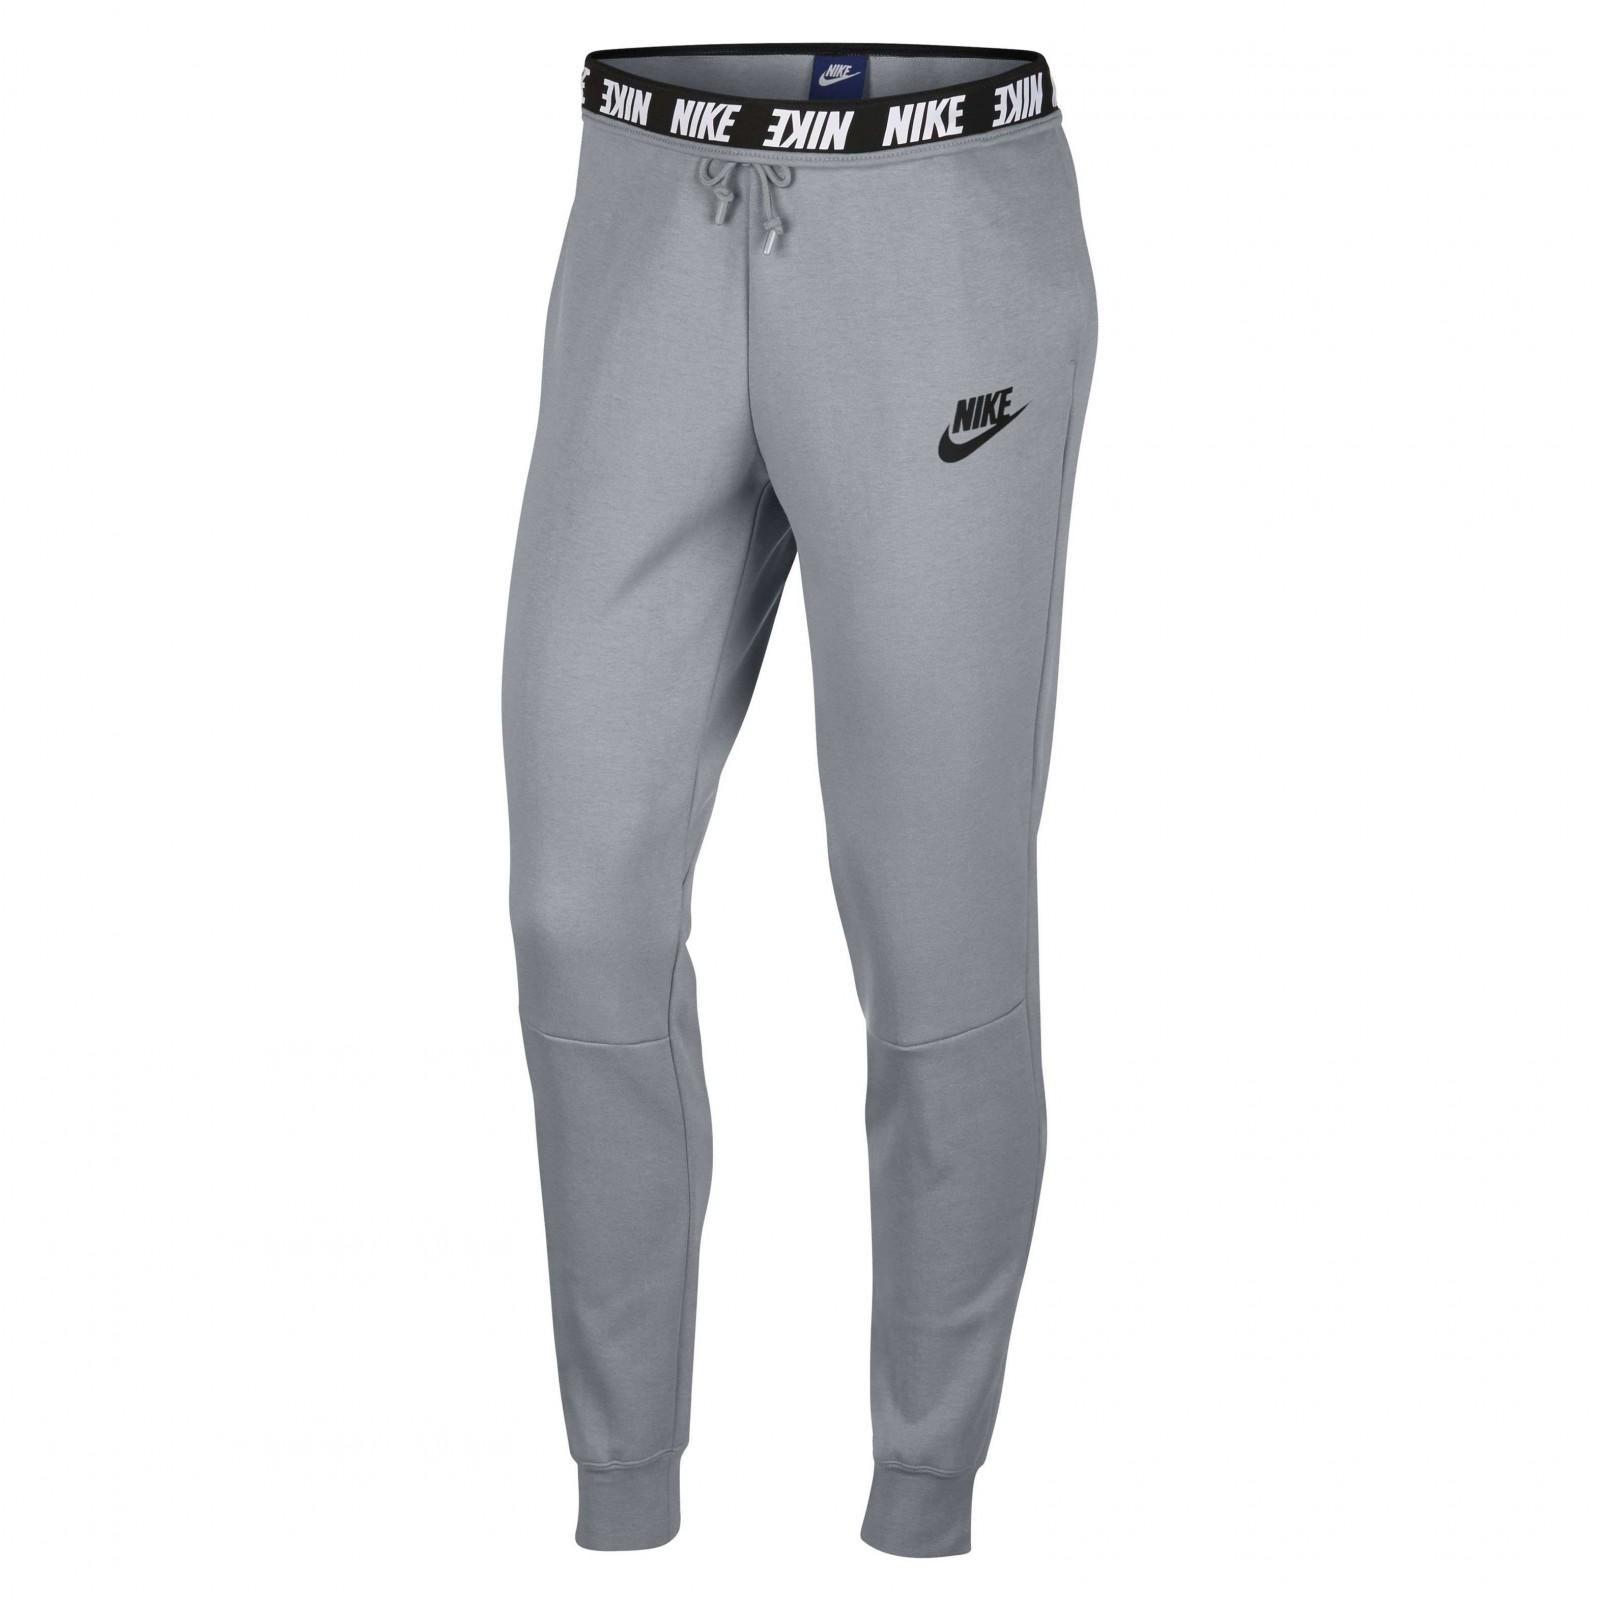 Nike W nsw av15 pant DK GREY HEATHER BLACK - Glami.sk 2345c167d63